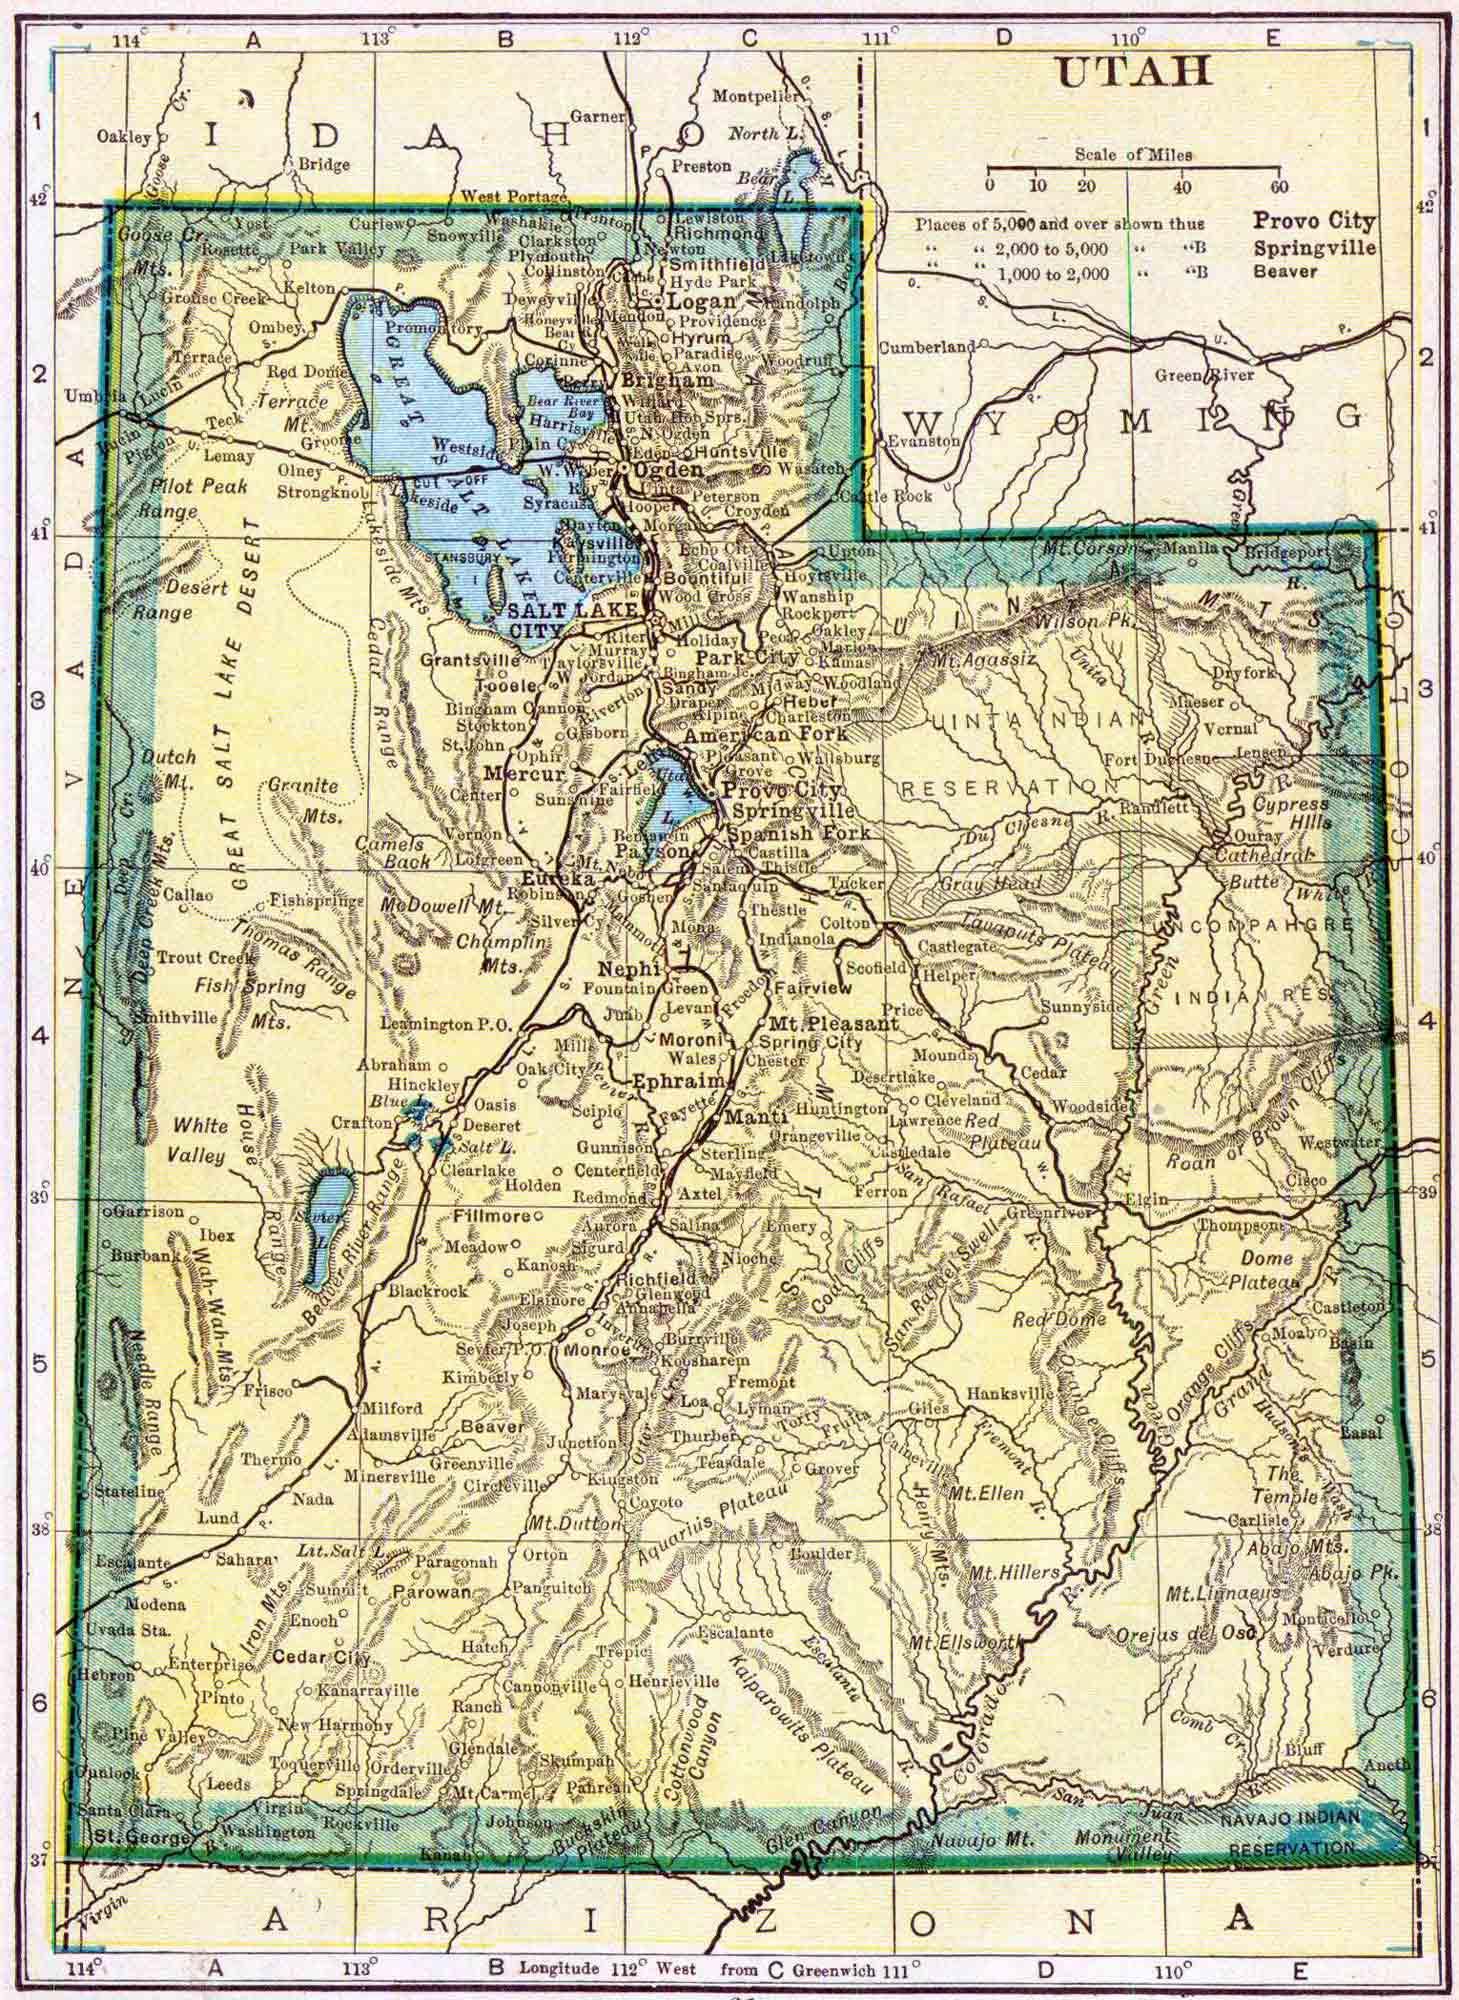 Utah Census Map Access Genealogy - Census us 1910 map